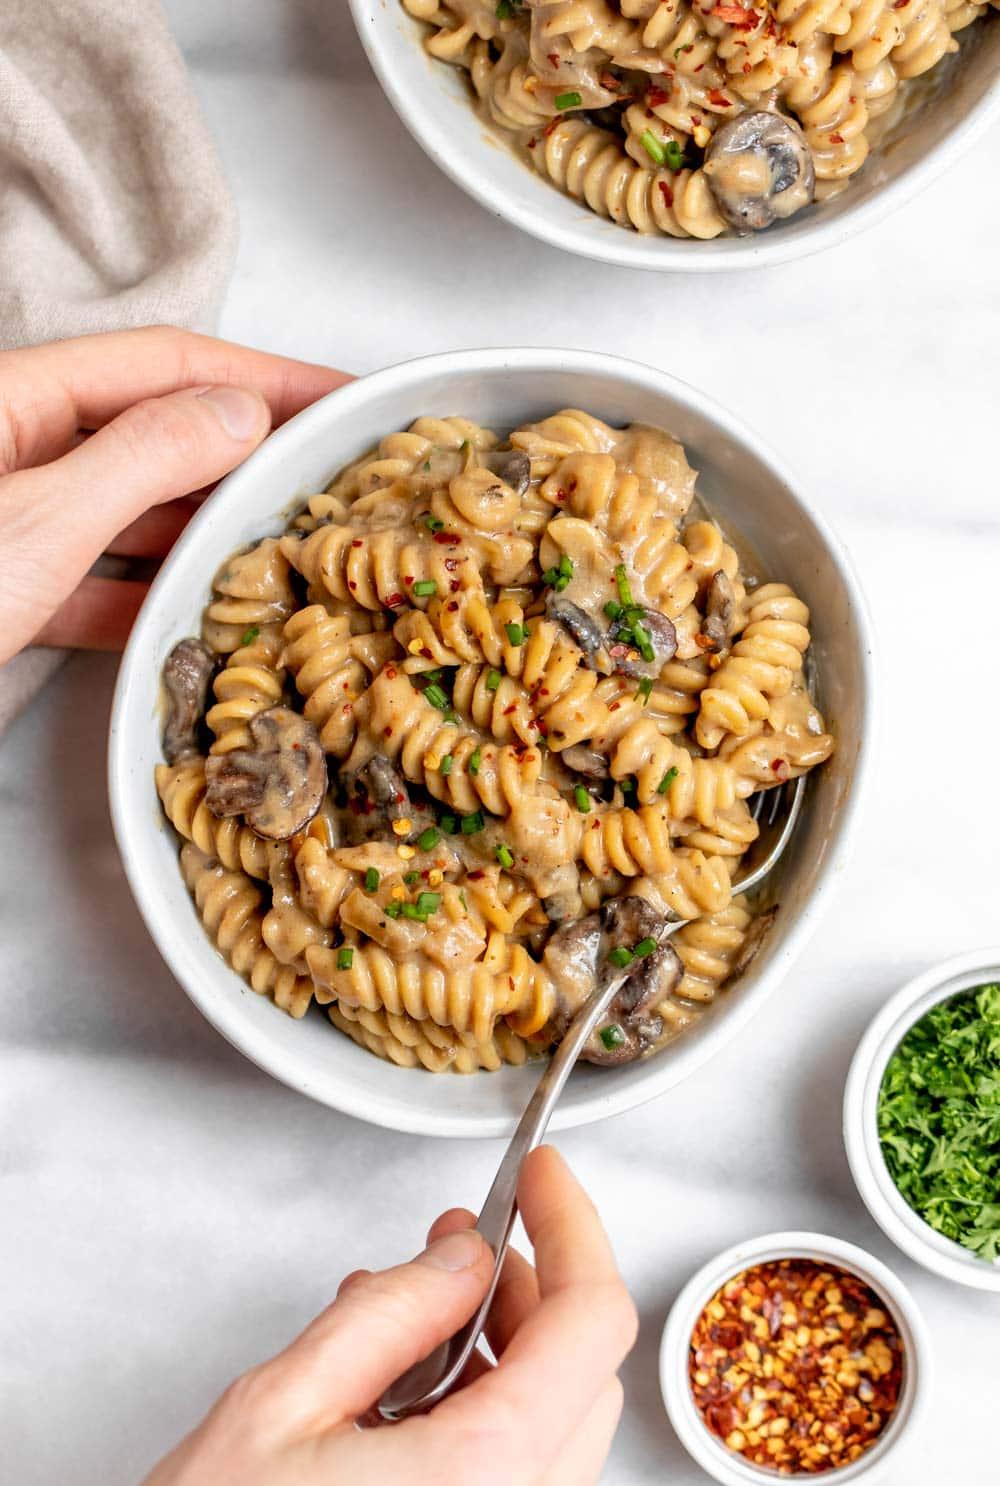 Vegan mushroom stroganoff in small bowls with parsley on top.